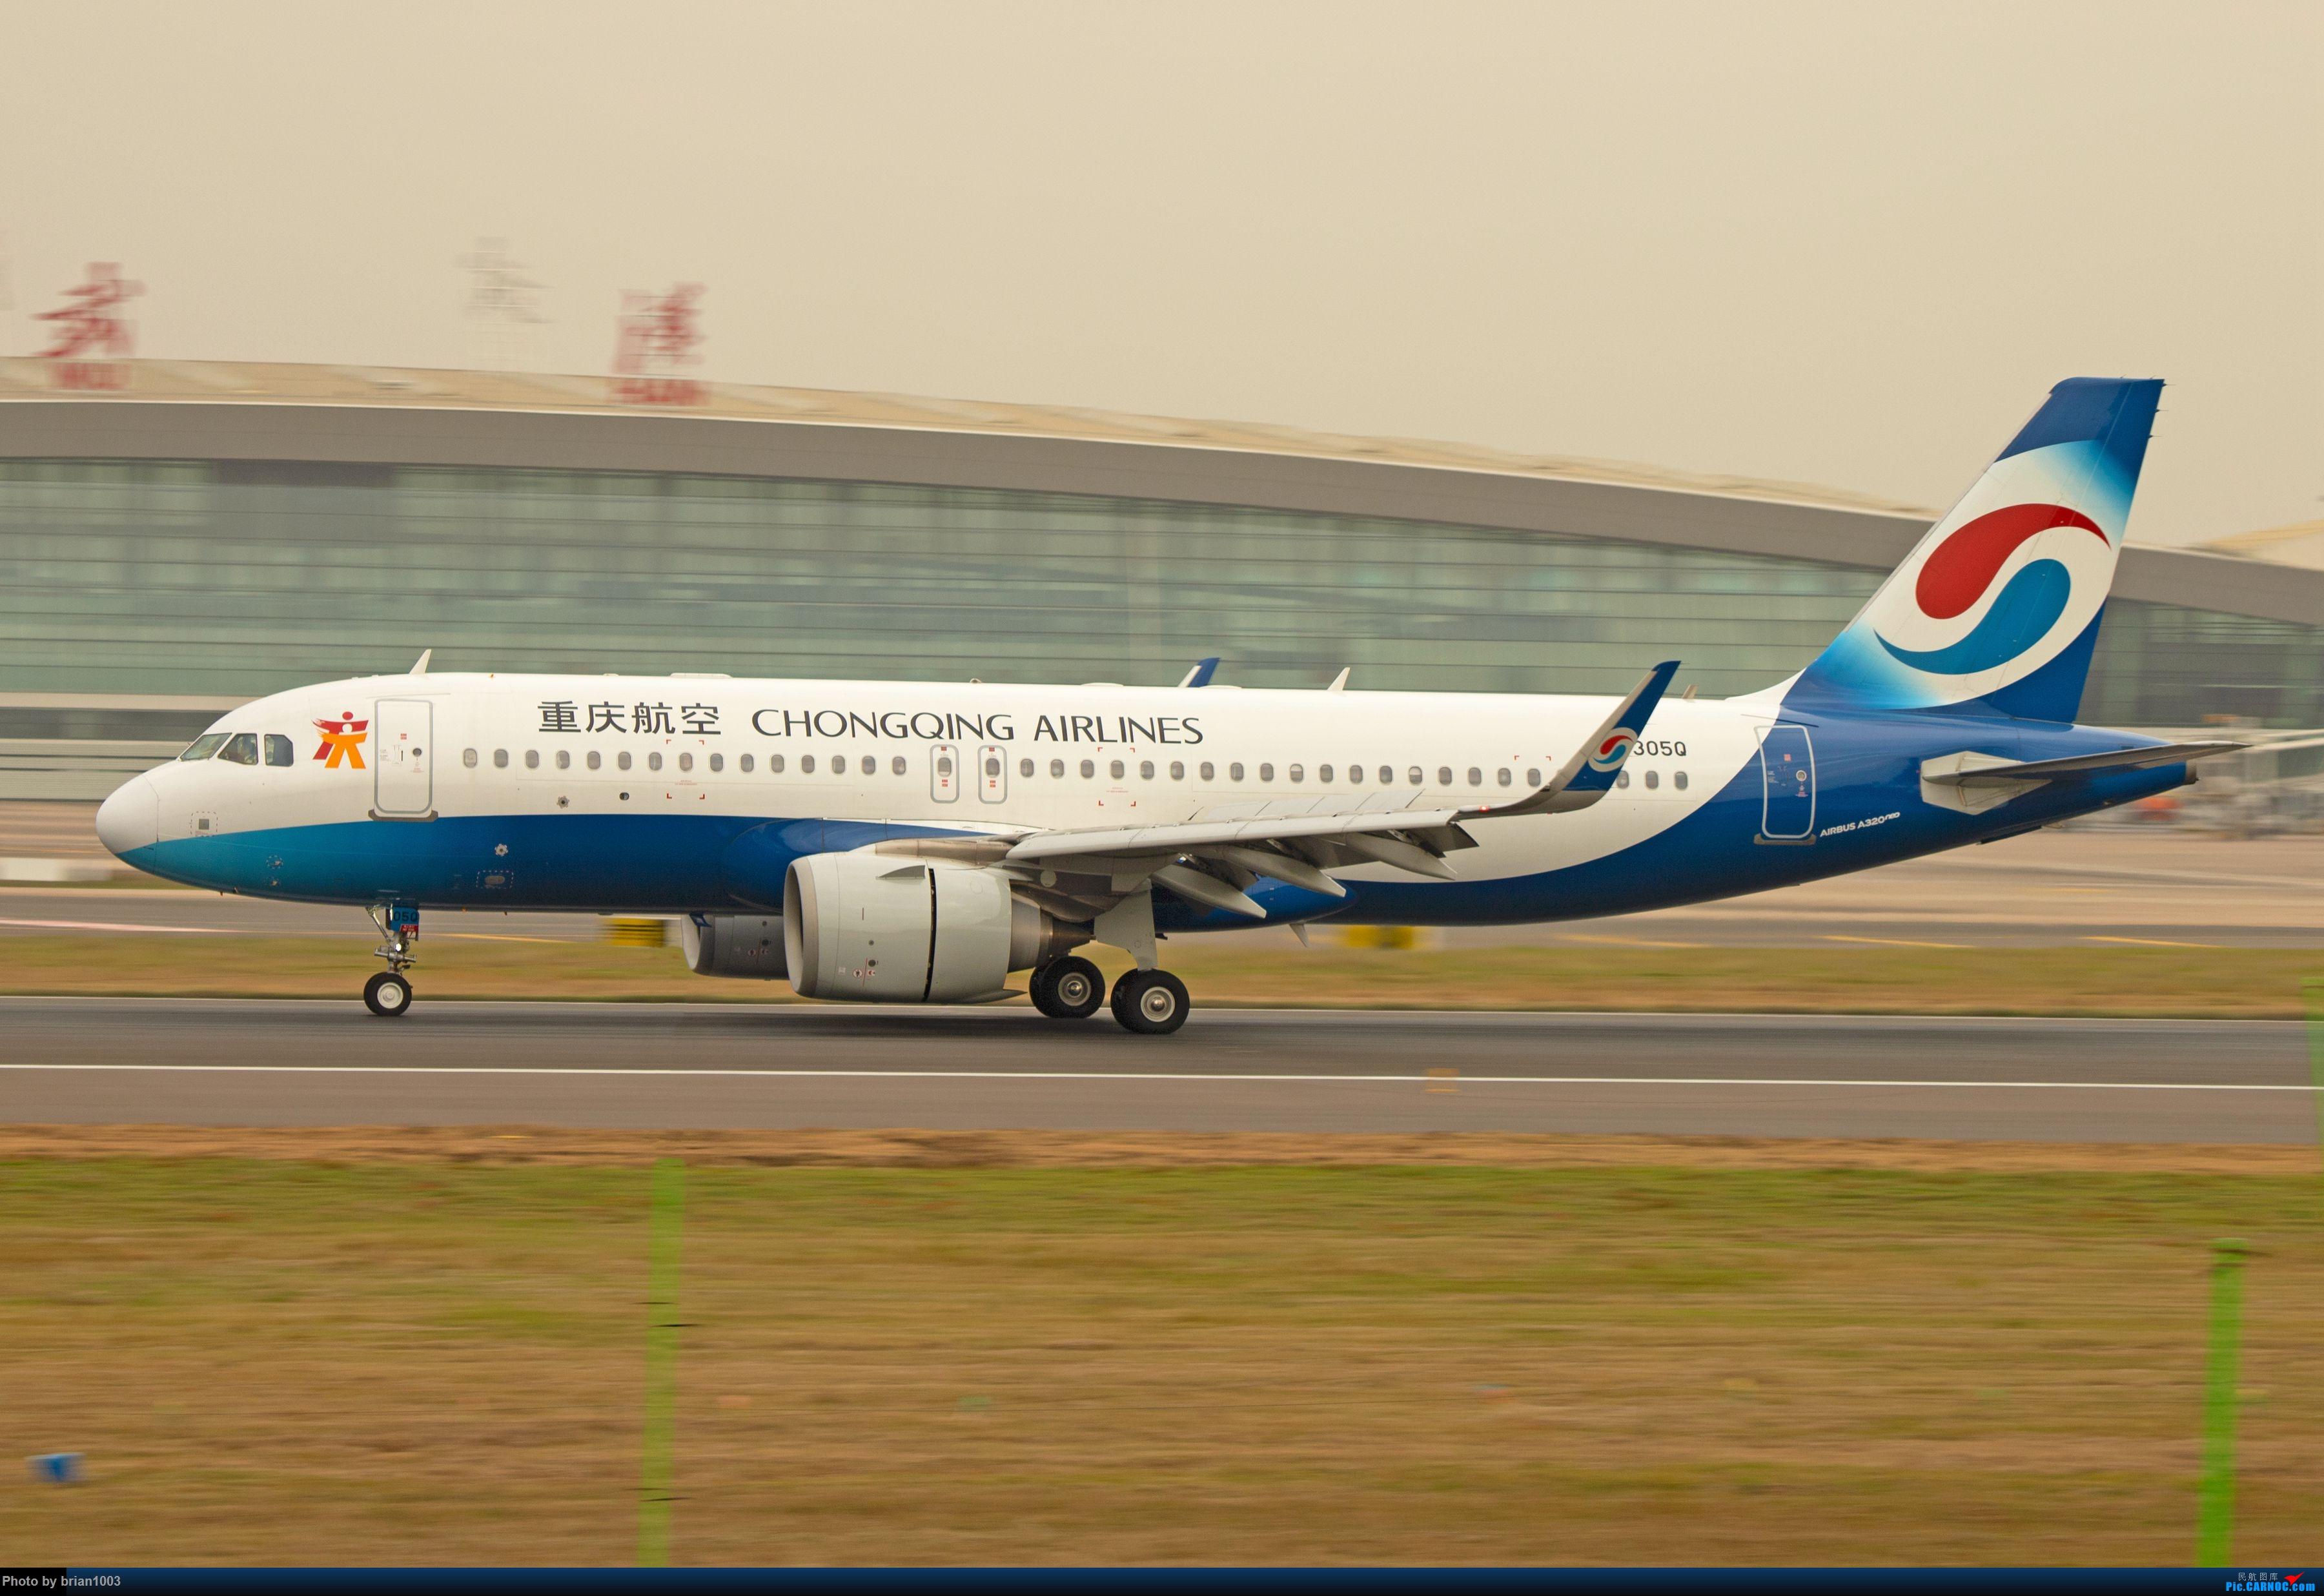 Re:]WUH天河机场拍机之九月、十月(含恢复的国际/地区航线、国航77W星盟涂装、南航789) AIRBUS A320NEO B-305Q 中国武汉天河国际机场